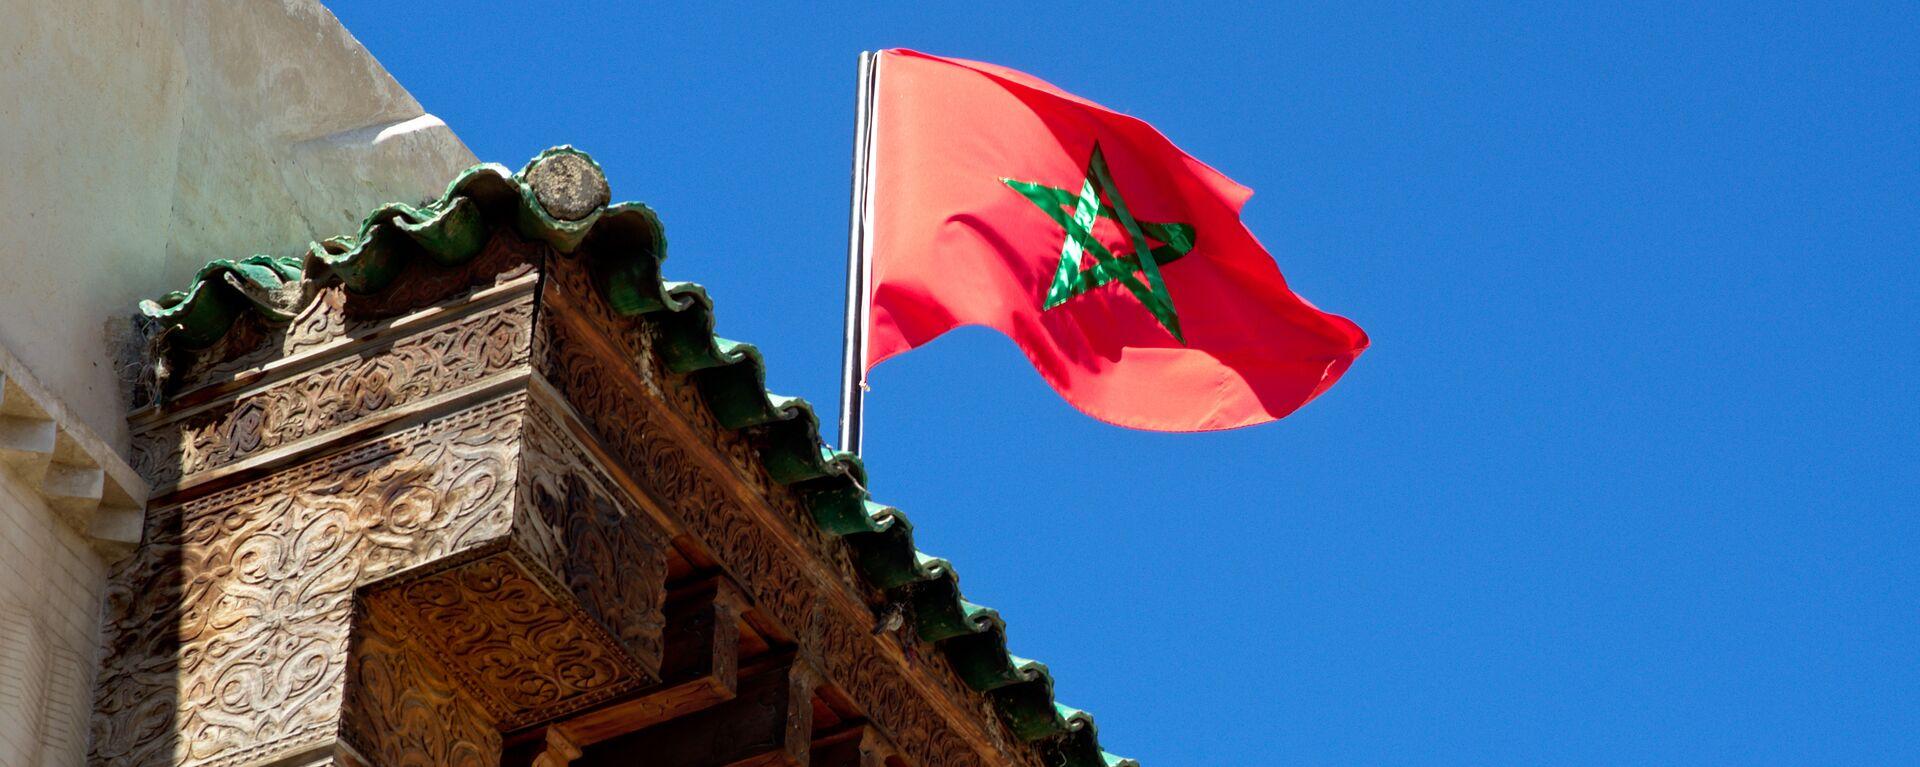 La bandera de Marruecos - Sputnik Mundo, 1920, 28.05.2021